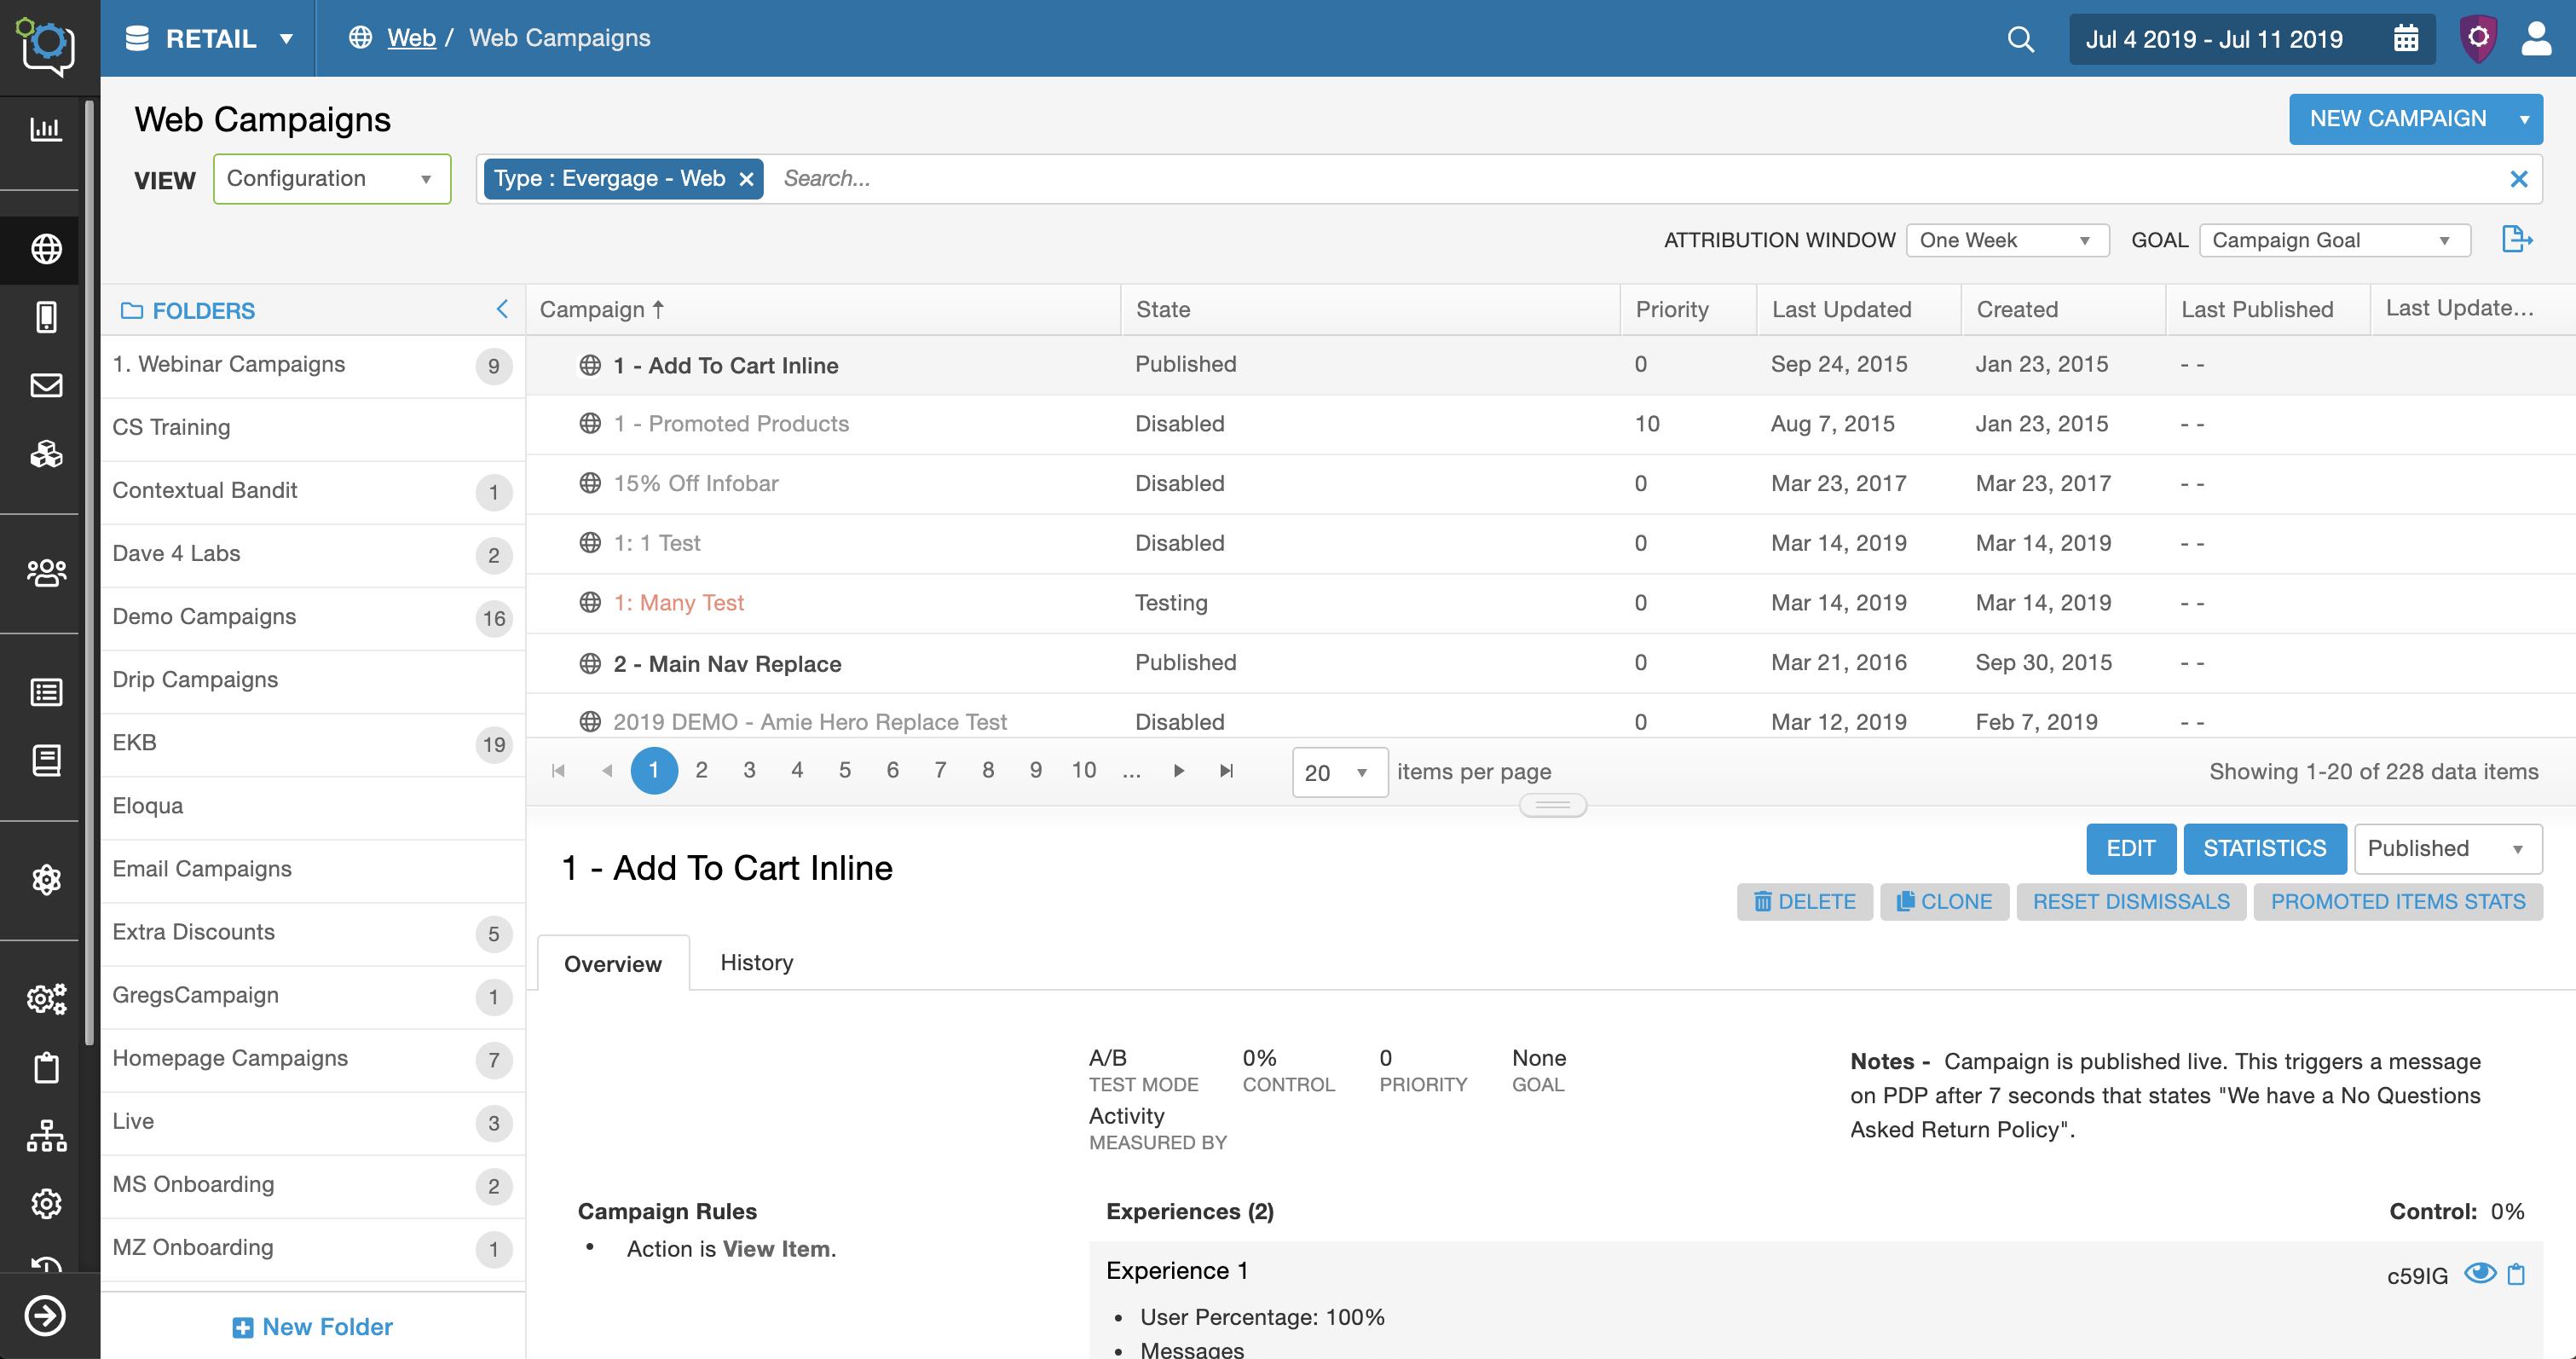 Campaign List Screen UI – Configuration